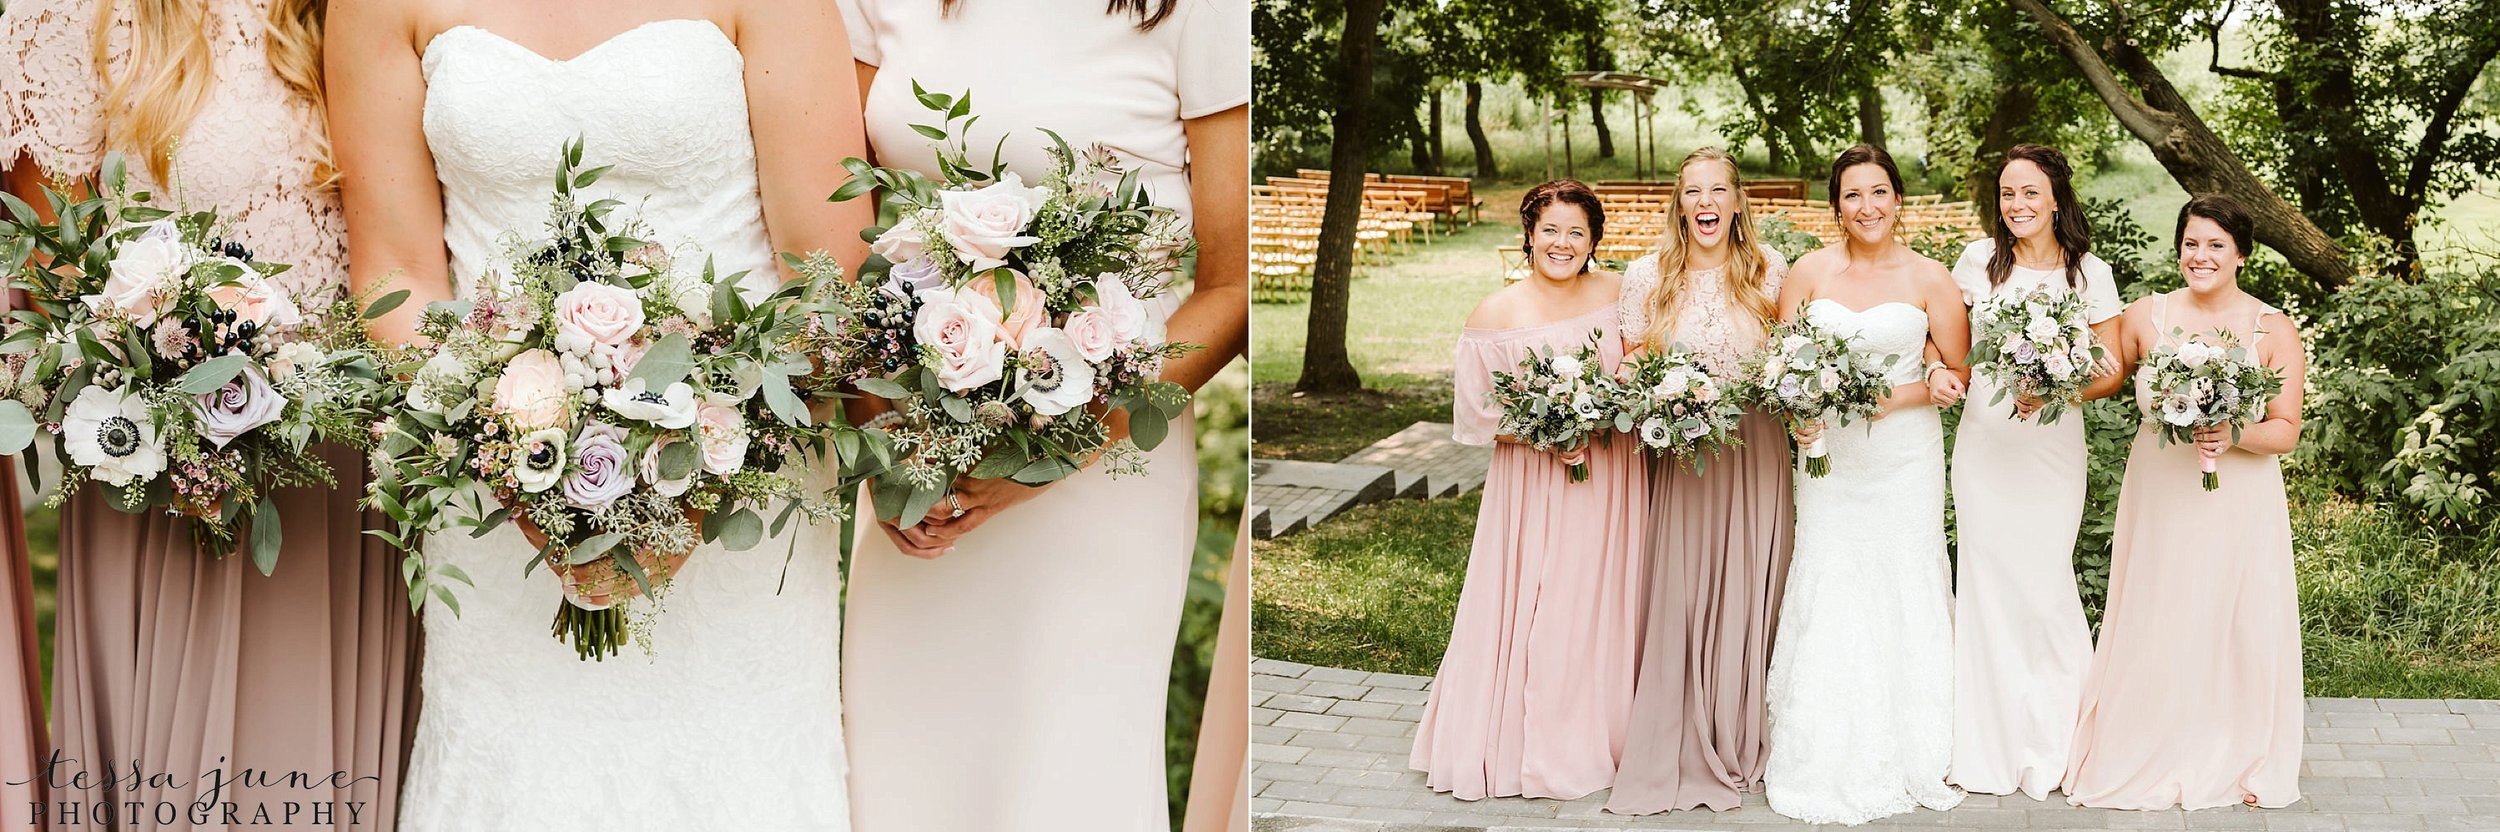 gathered-oaks-barn-wedding-alexandria-minnesota-9.jpg